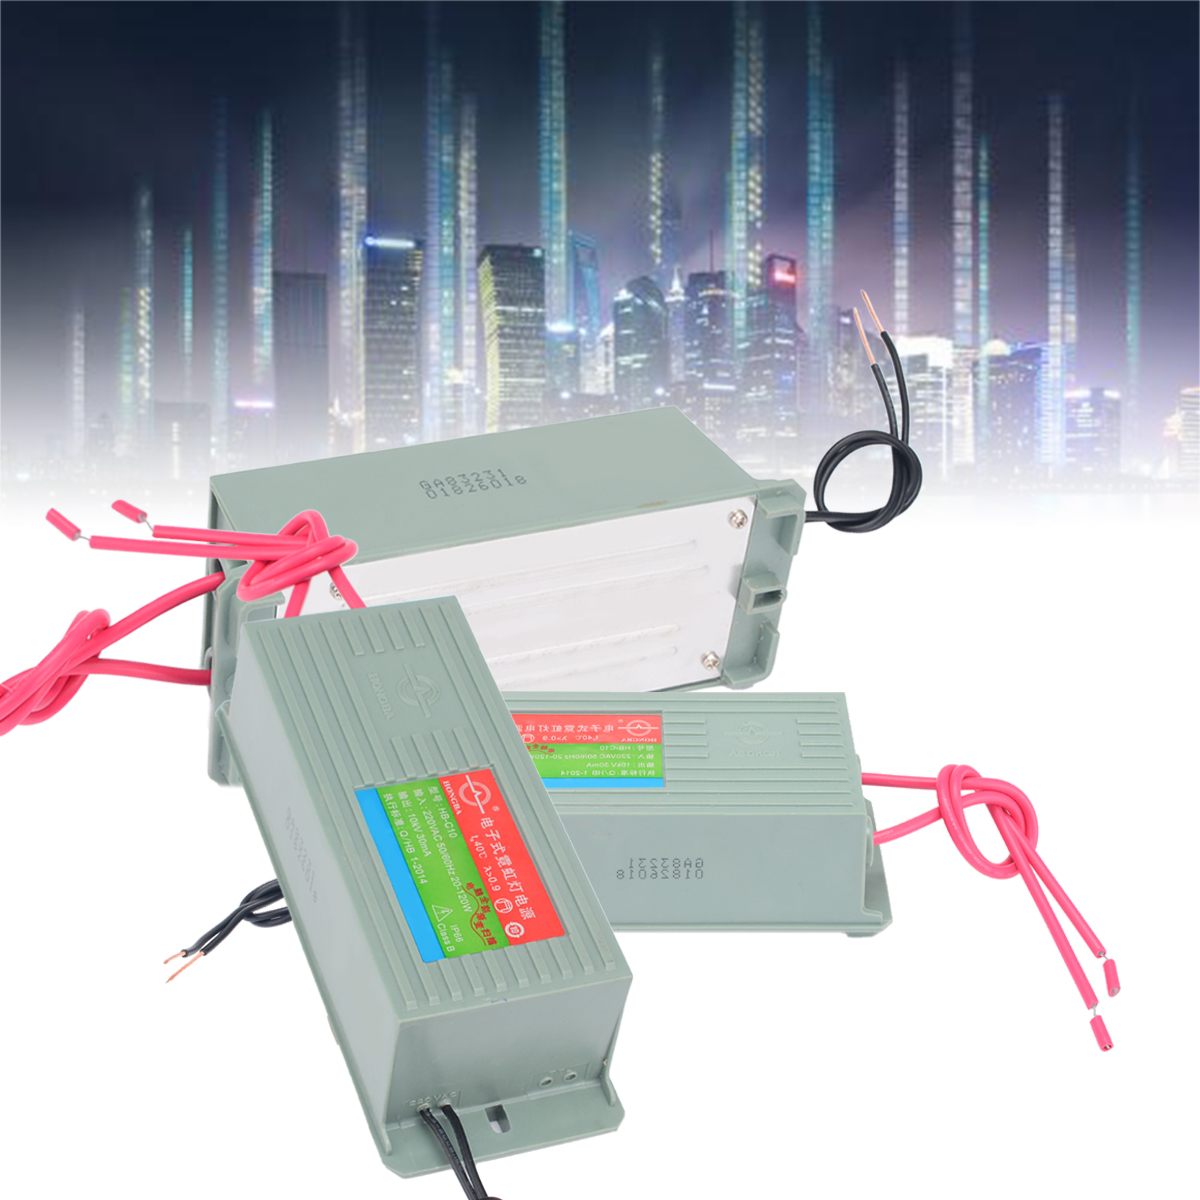 1pc 50/60Hz 20-120W Neon Electronic Transformer HB-C10 10KV 30mA Neon Power Supply Rectifier 10kv 30ma high frequency neon electronic transformer 100w load 10m neon power supply rectifier 220v ac